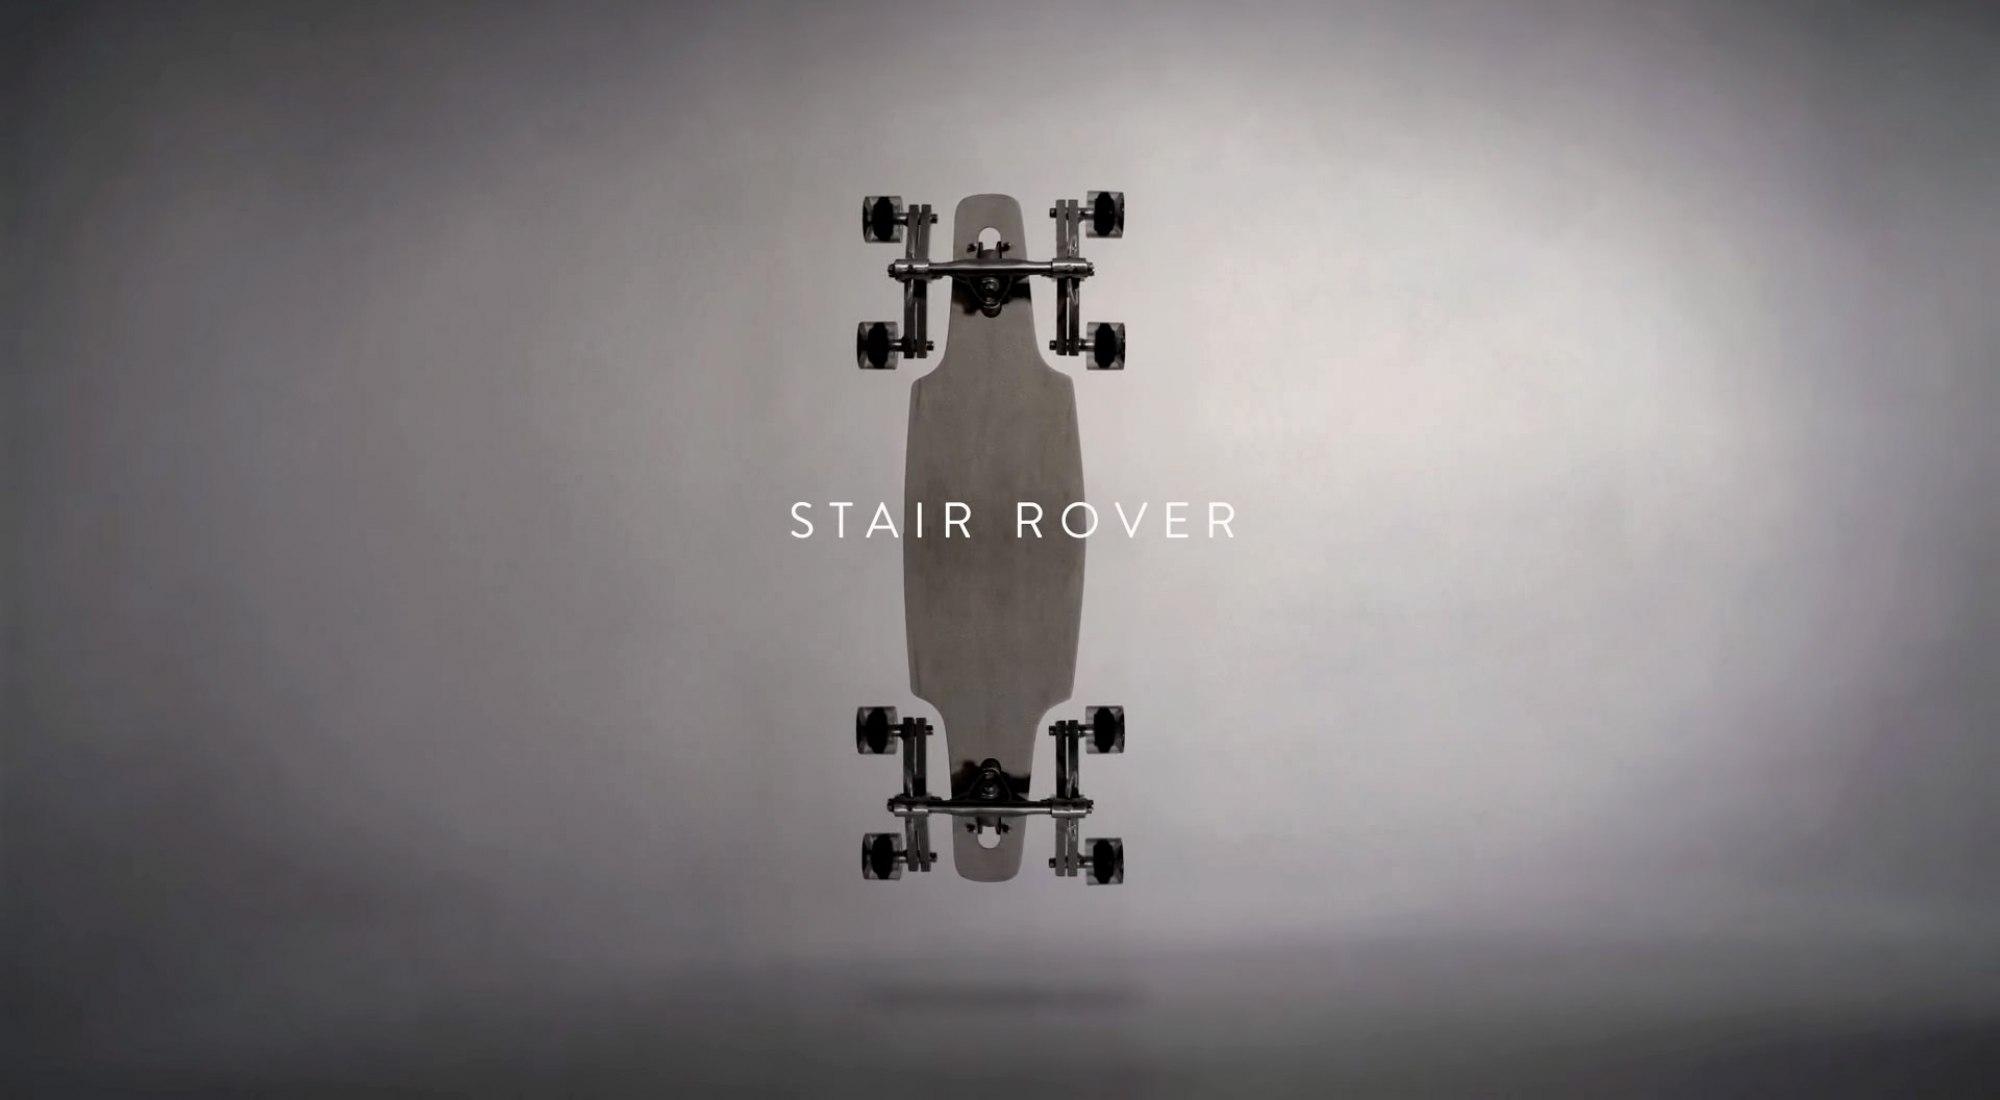 Stair Rover por Po-Chih Lai